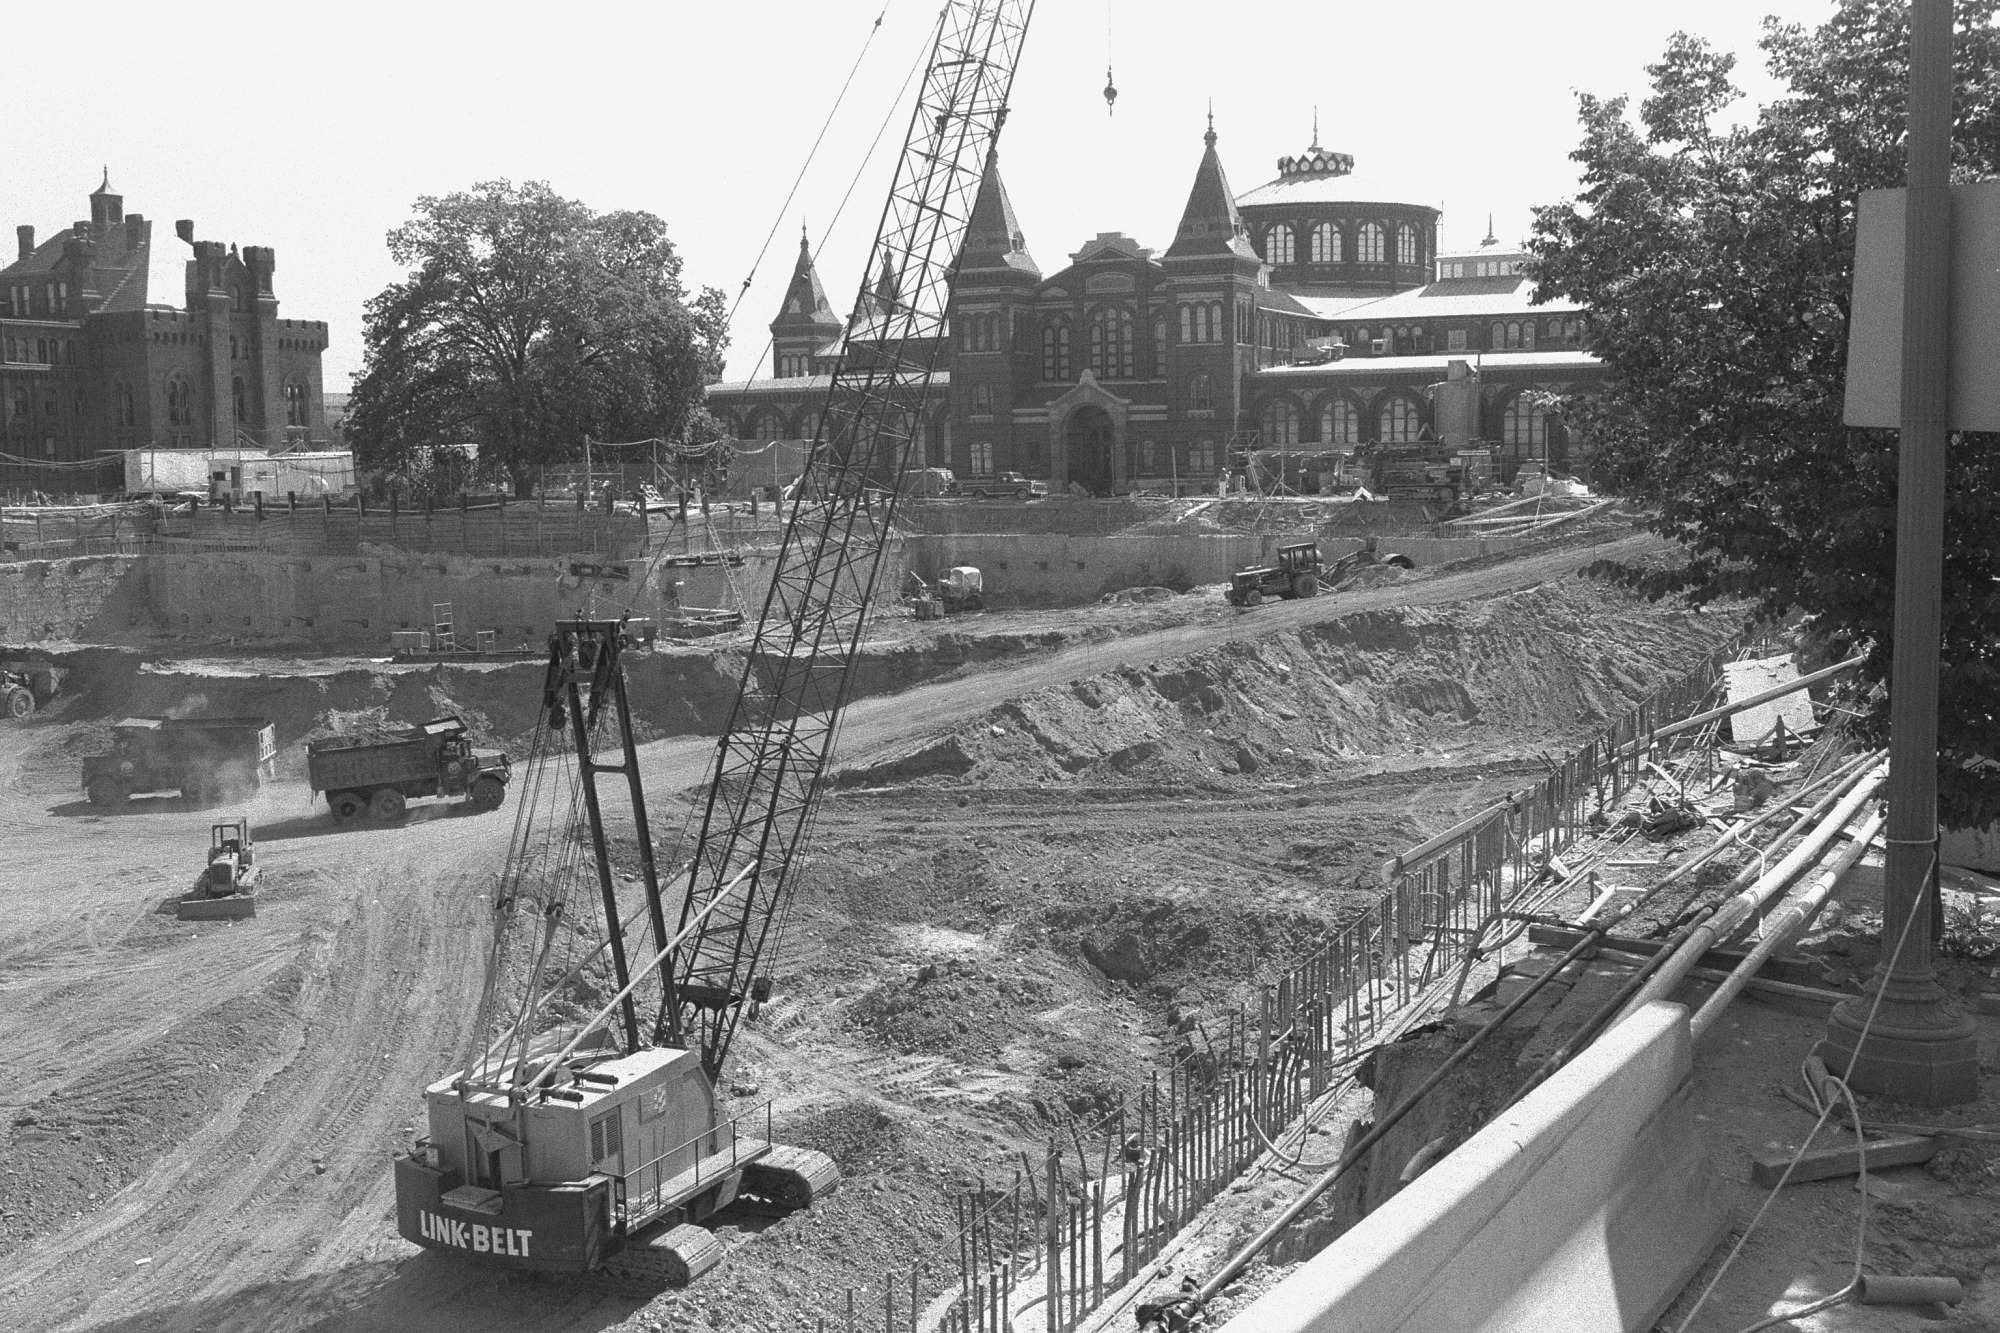 Excavation for Quad Construction